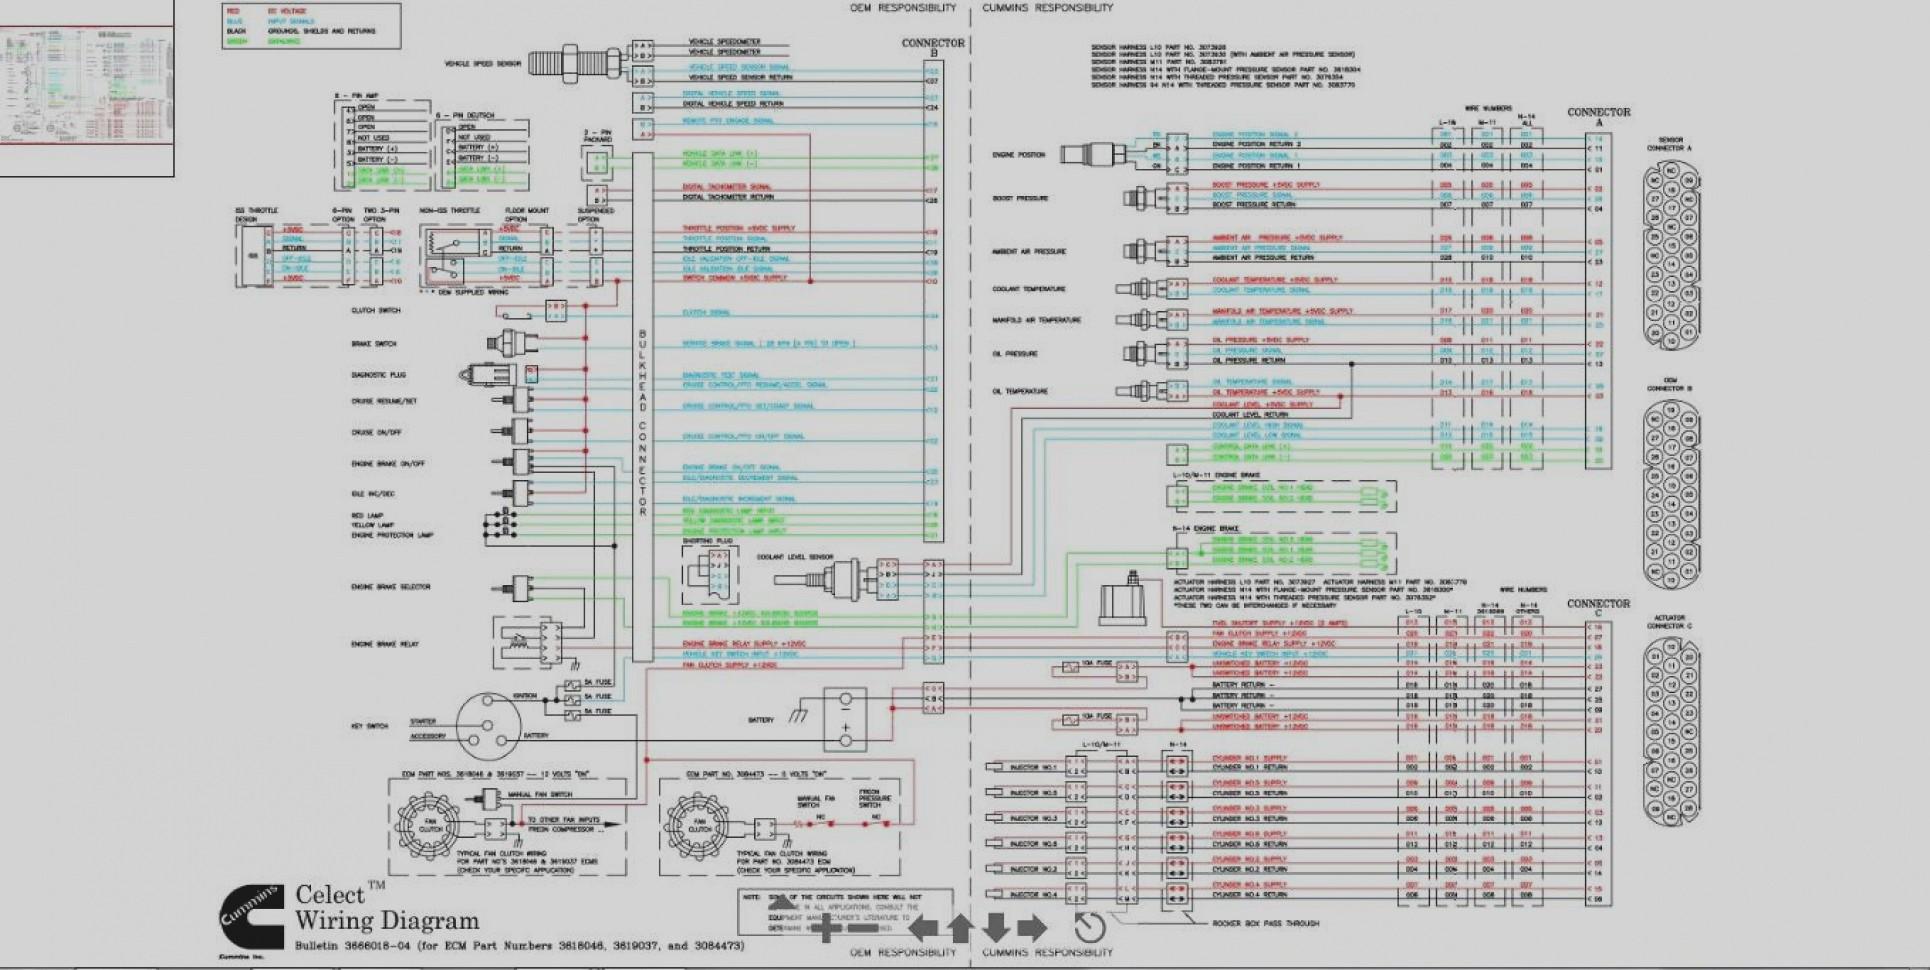 Cummins Isb Ecu Wiring Diagram. n14 celect wiring diagram. keygen cummins  isb 23 pin wiring diagram. ecm details for 1998 2002 dodge ram trucks with  24 valve. cummins ecu wiring diagram wiring2002-acura-tl-radio.info